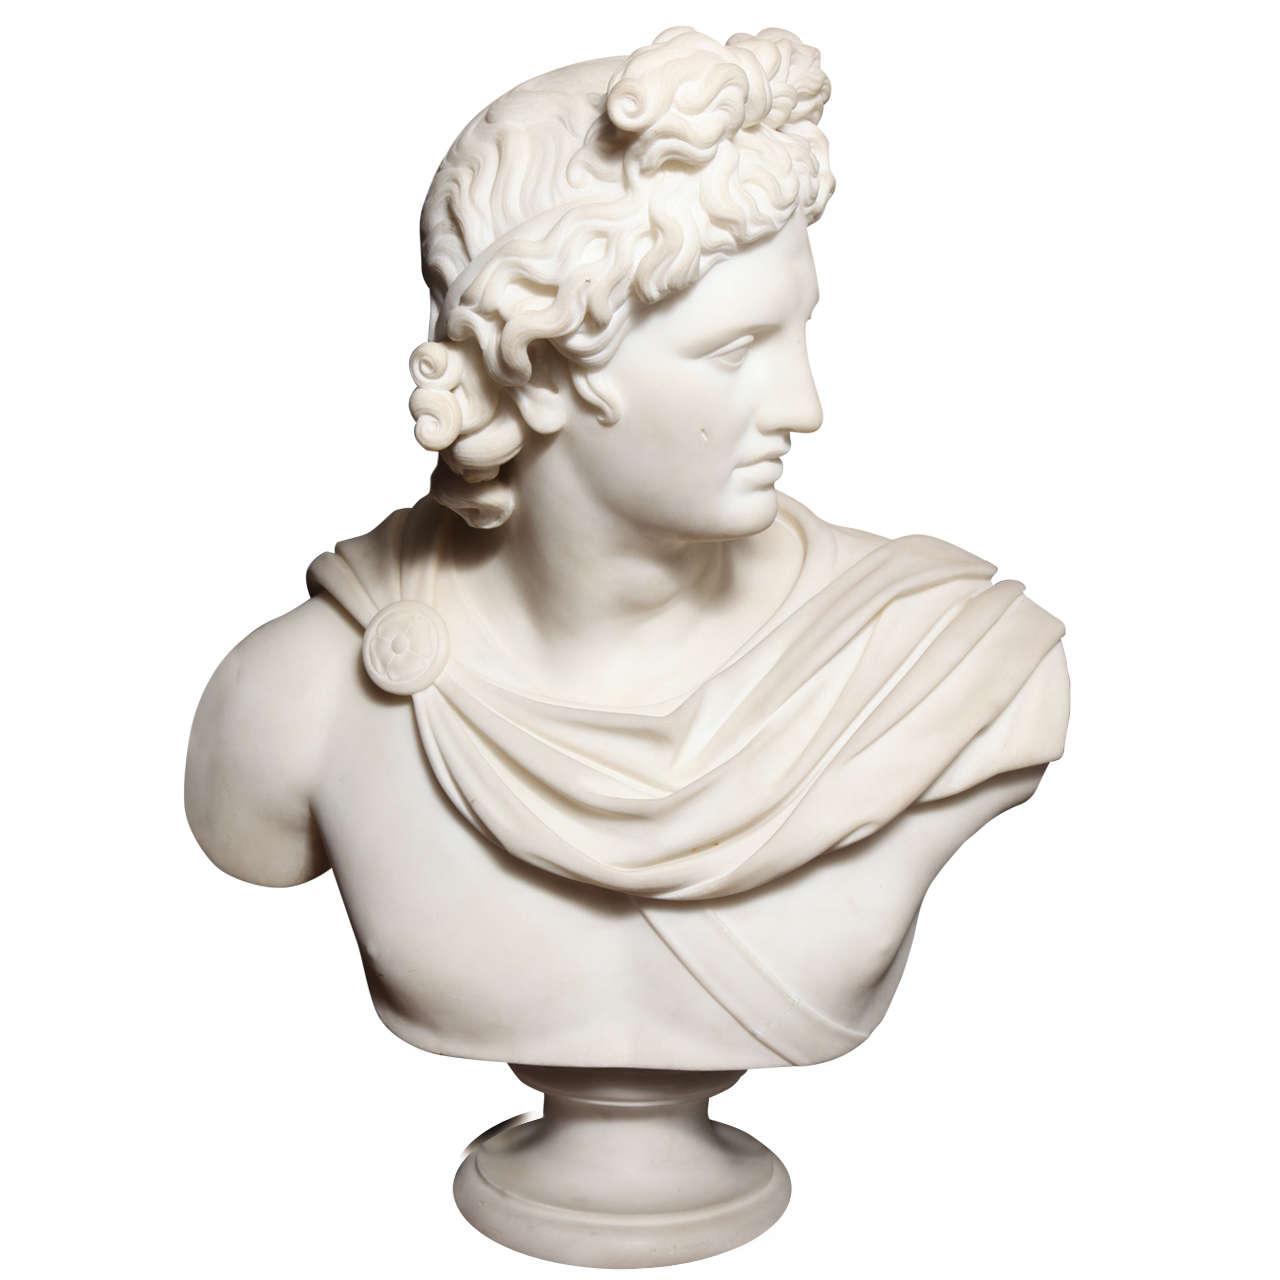 A Large Antique Italian Carrara Marble Bust Of Apollo For